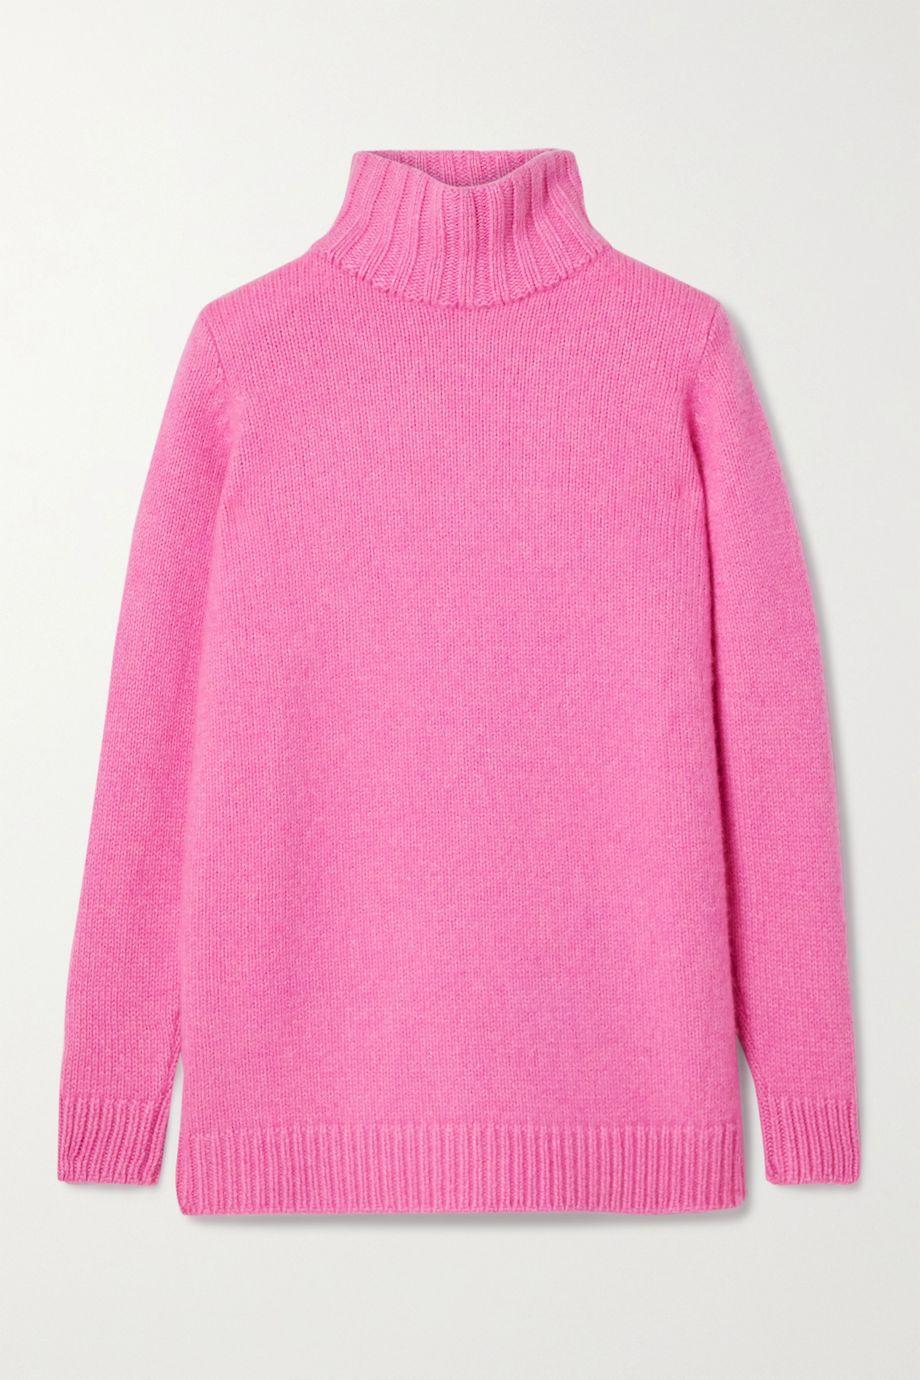 The Elder Statesman Cashmere turtleneck sweater